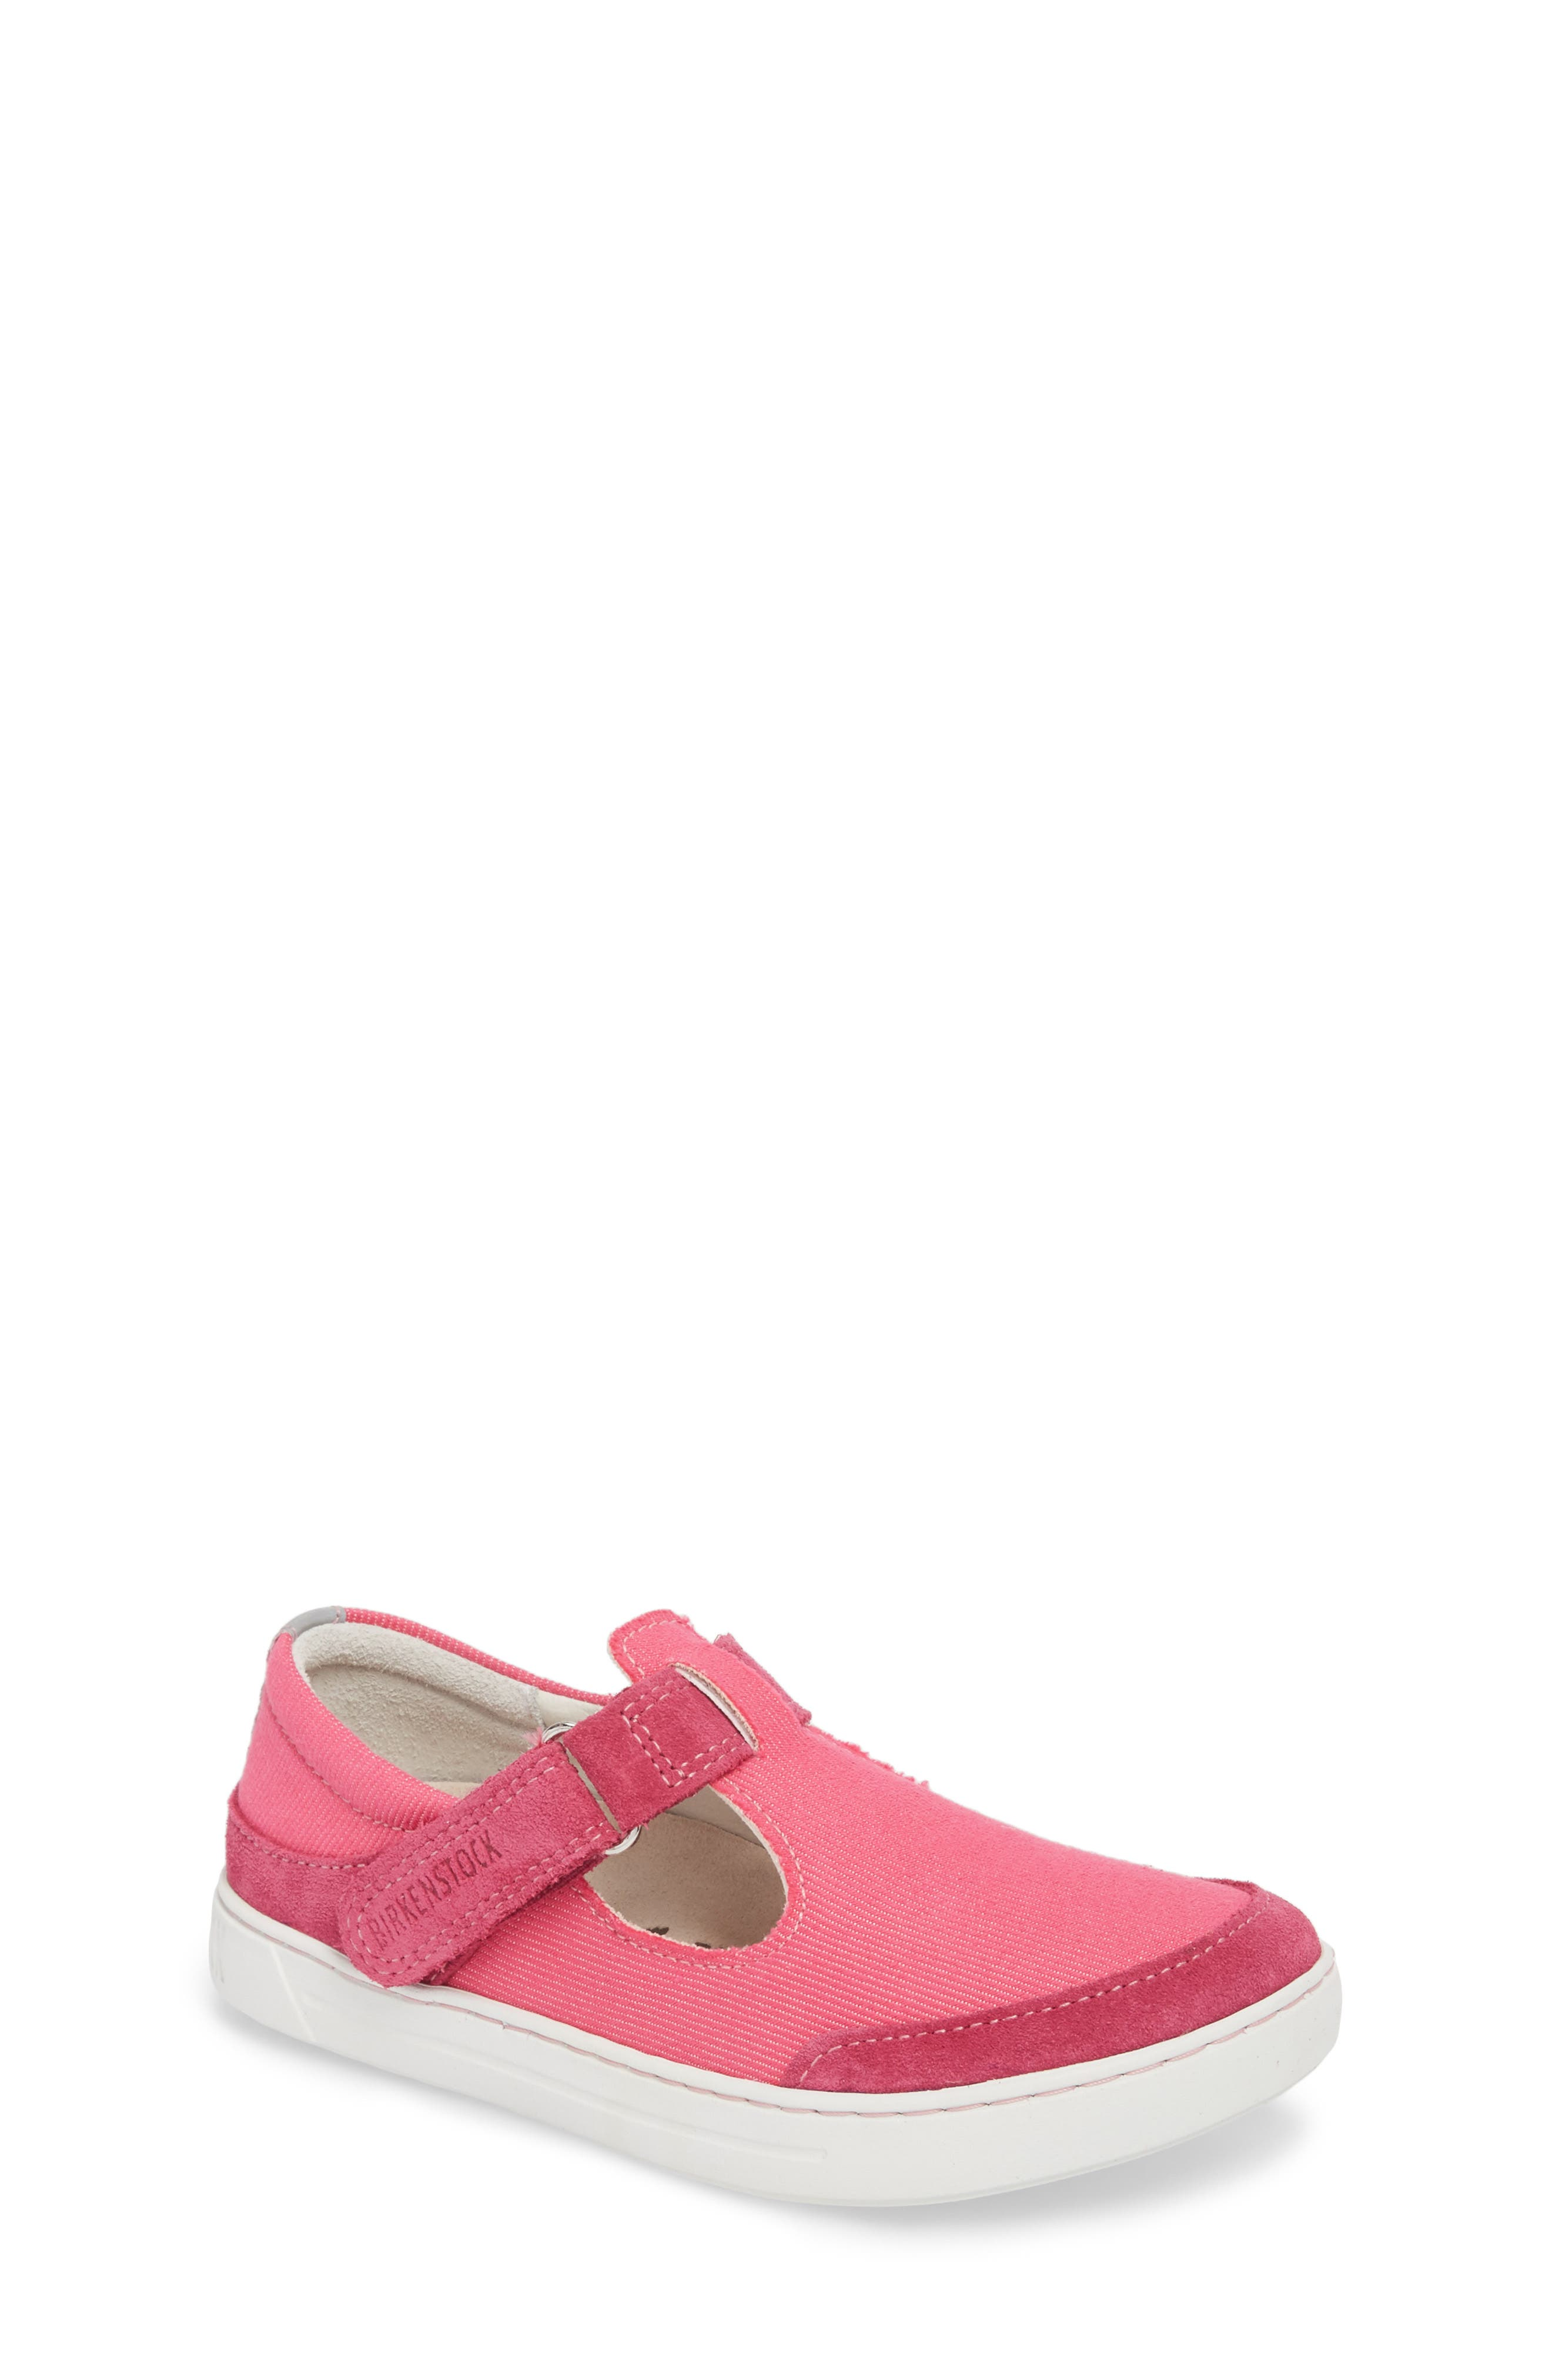 Abeline Sneaker,                             Main thumbnail 1, color,                             Pink